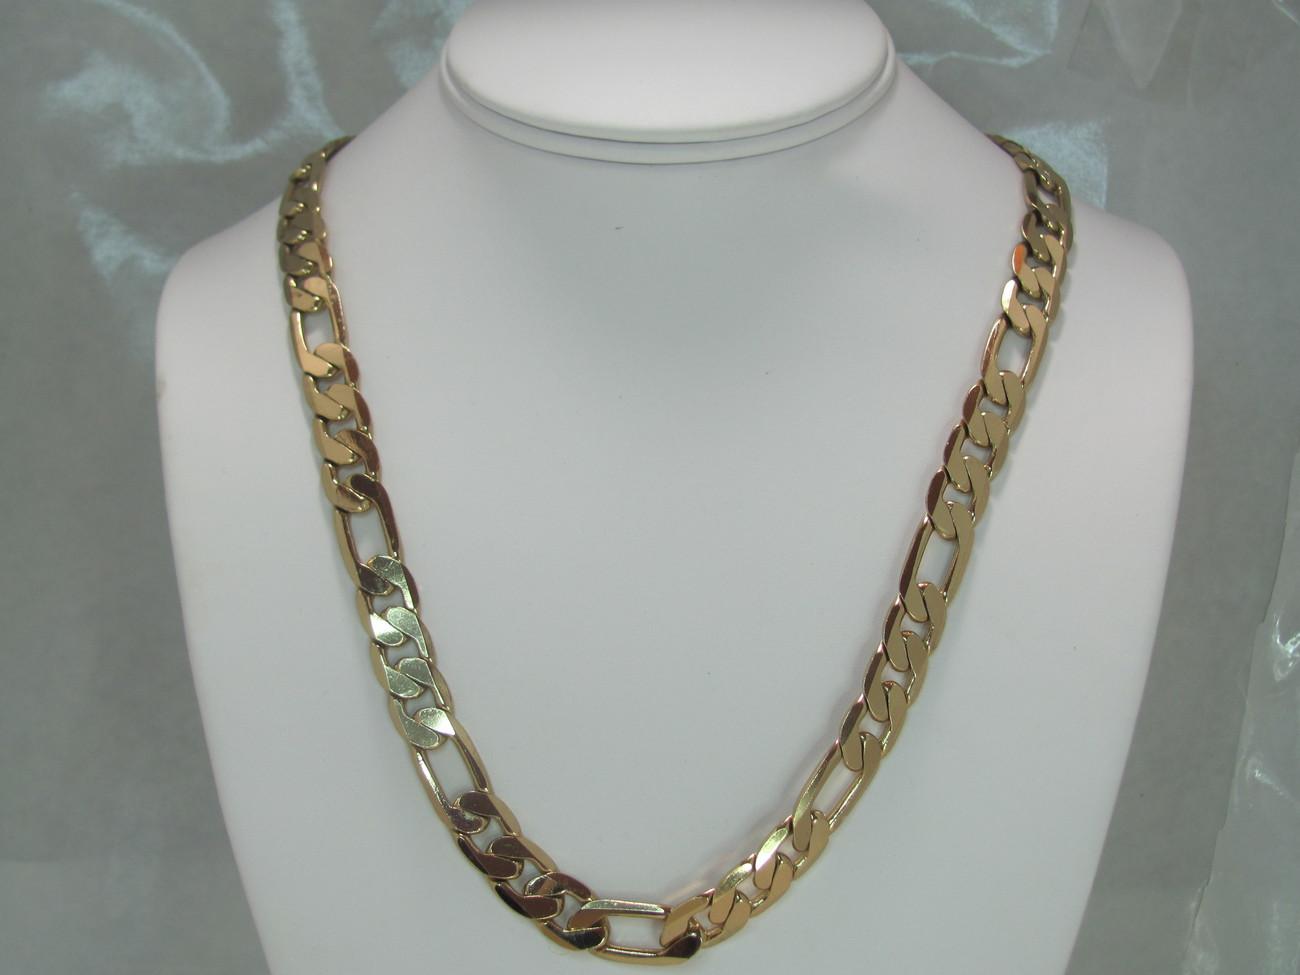 22in figaro bevelled fashion chain 24kt gp  Bonanza